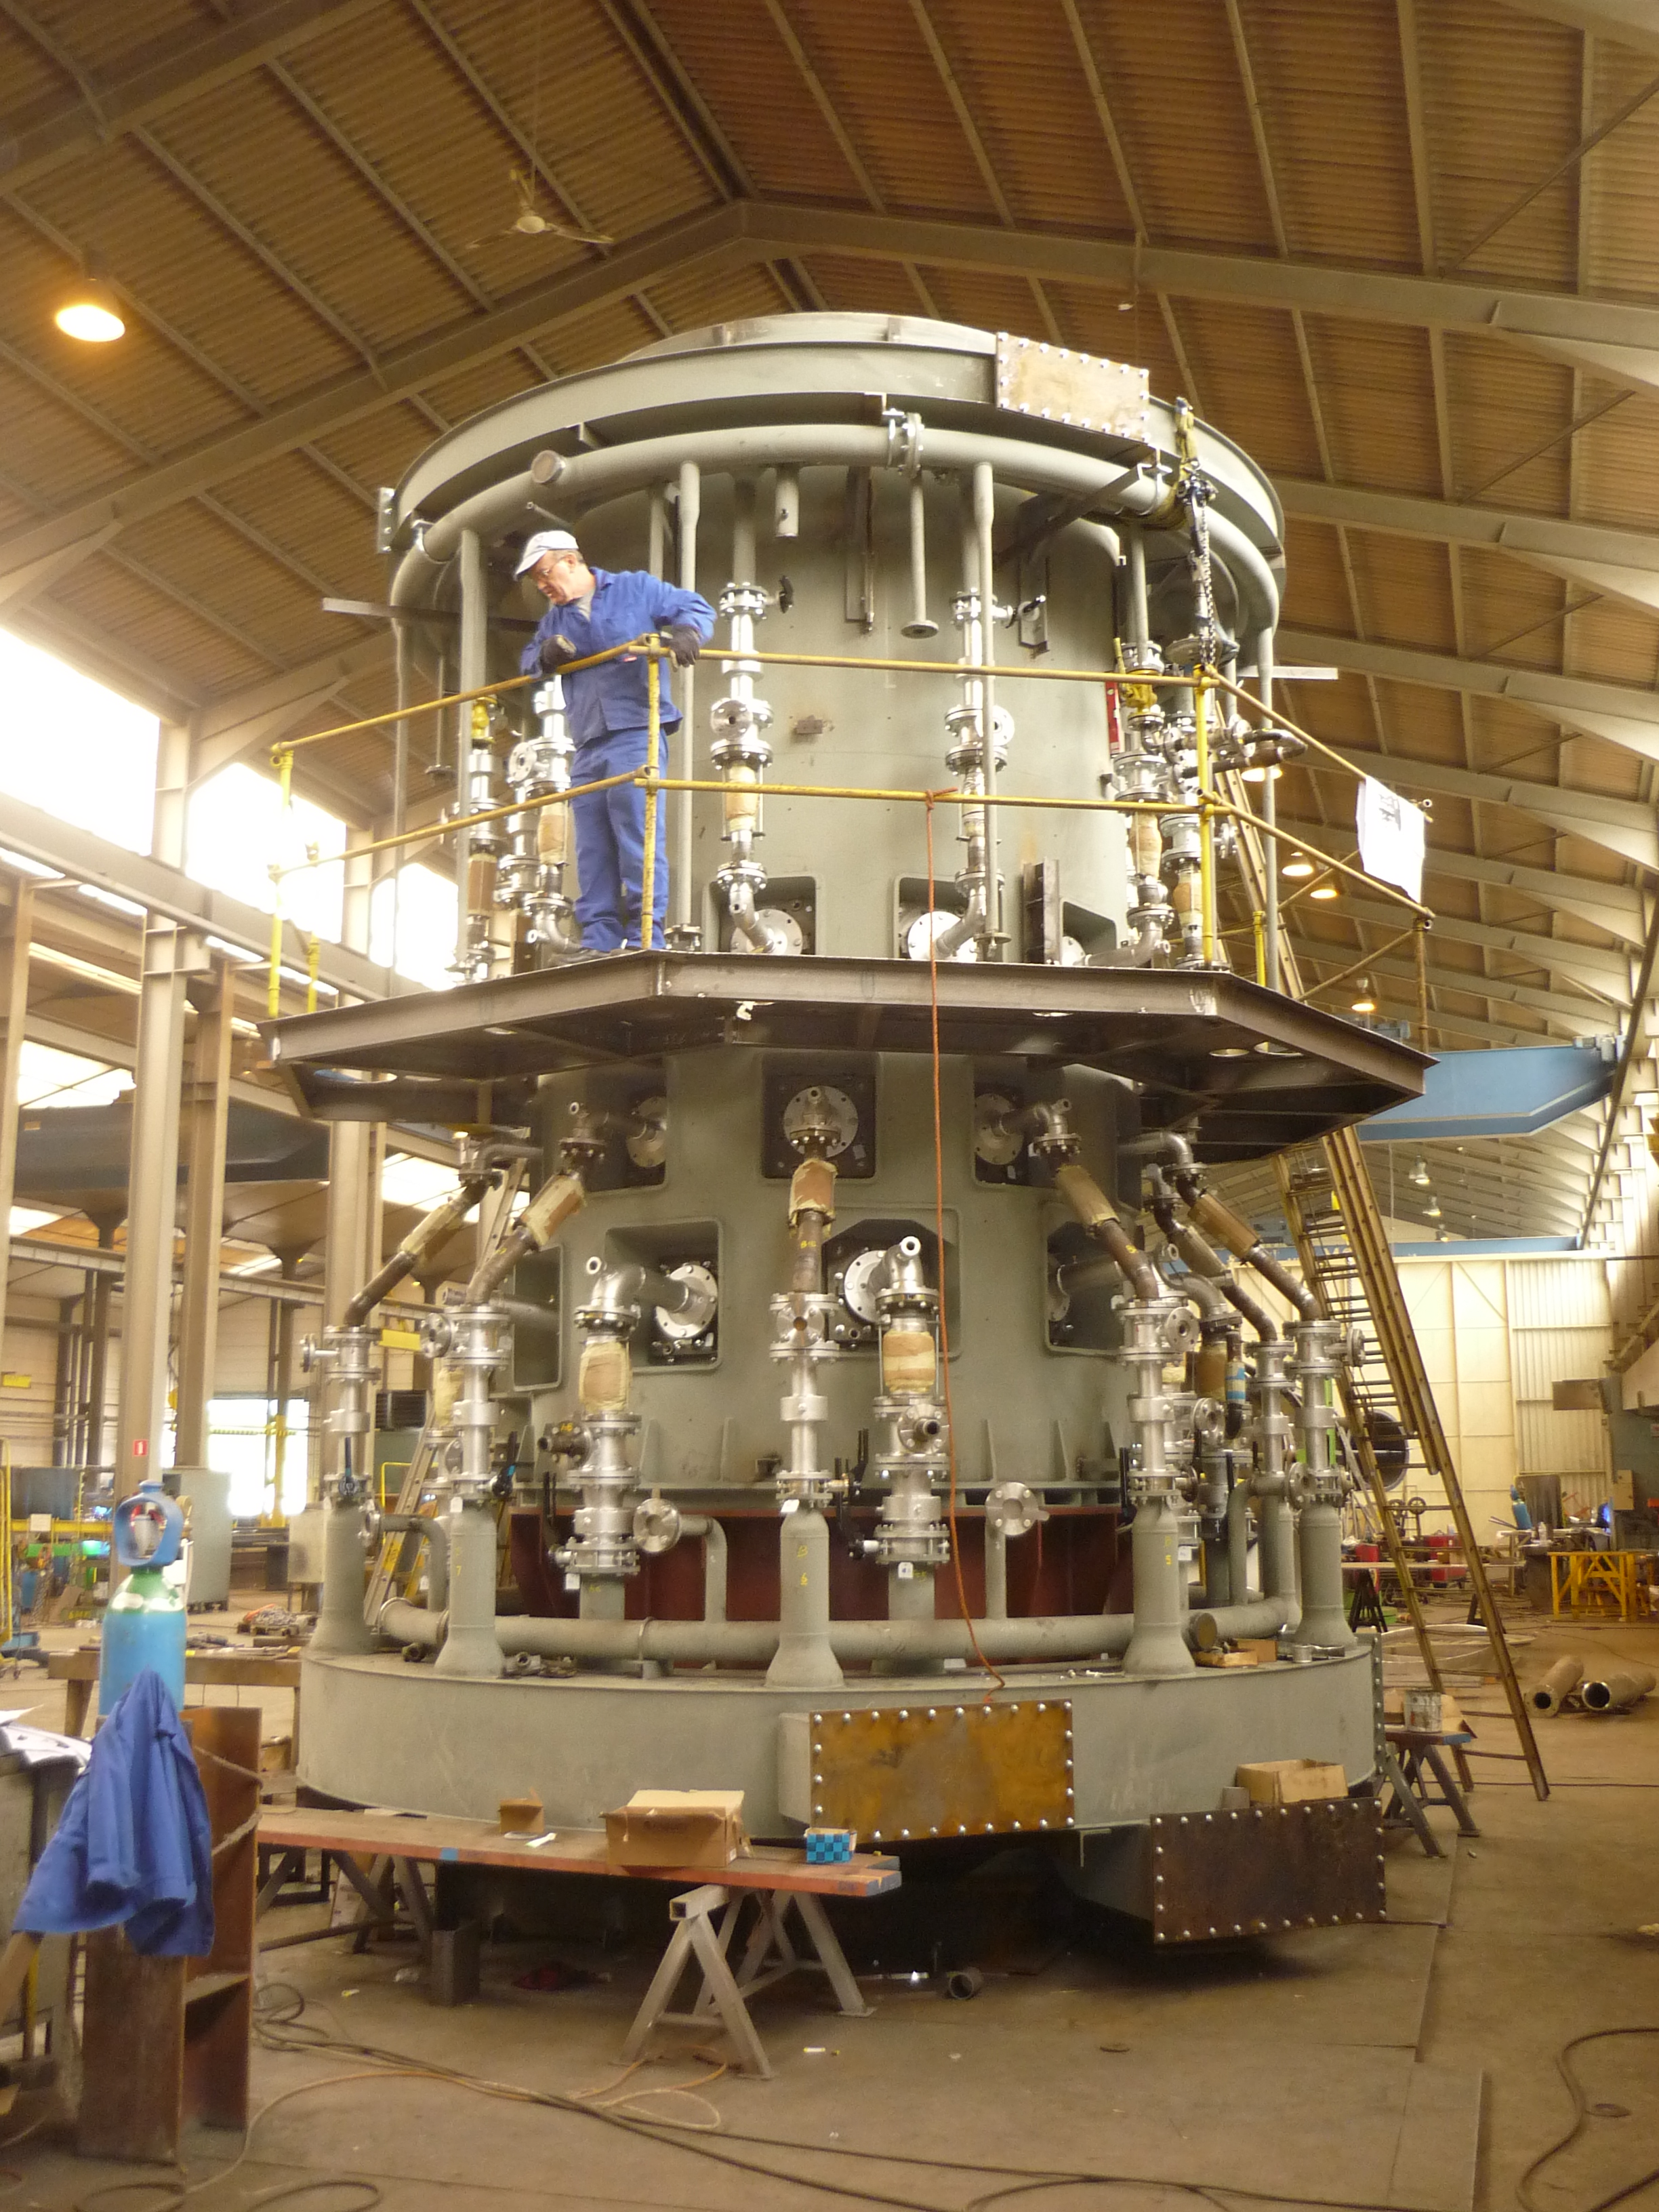 Produktion von Cupferschmelzofen / Production of cupper melting furnace